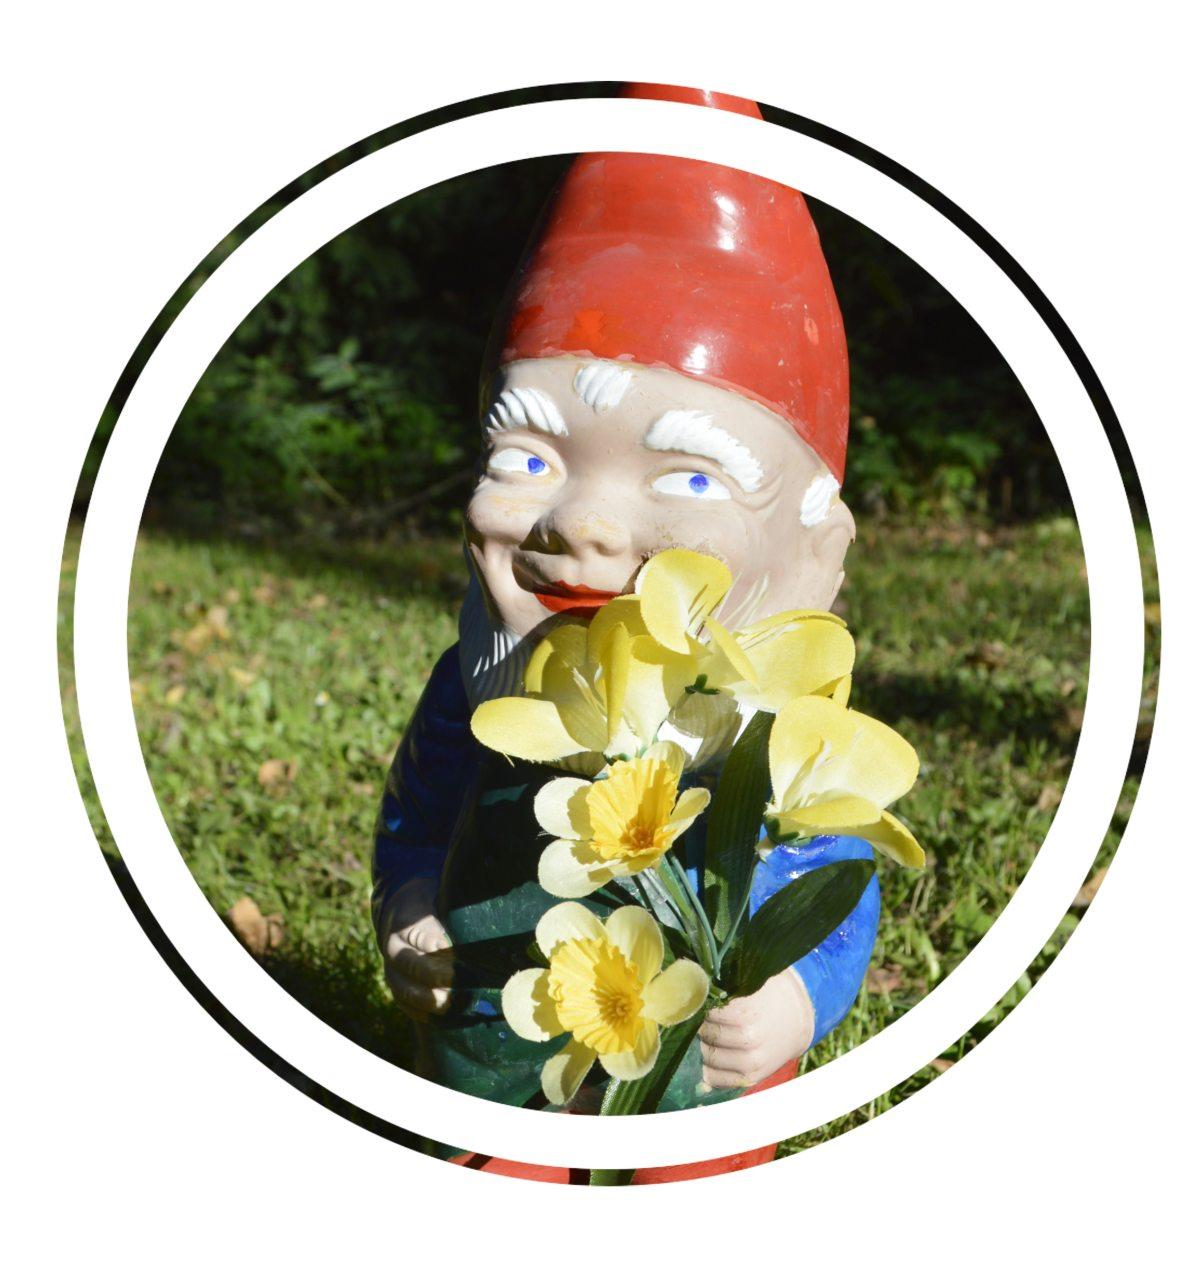 bekitschig.blog Garden Gnome Make over